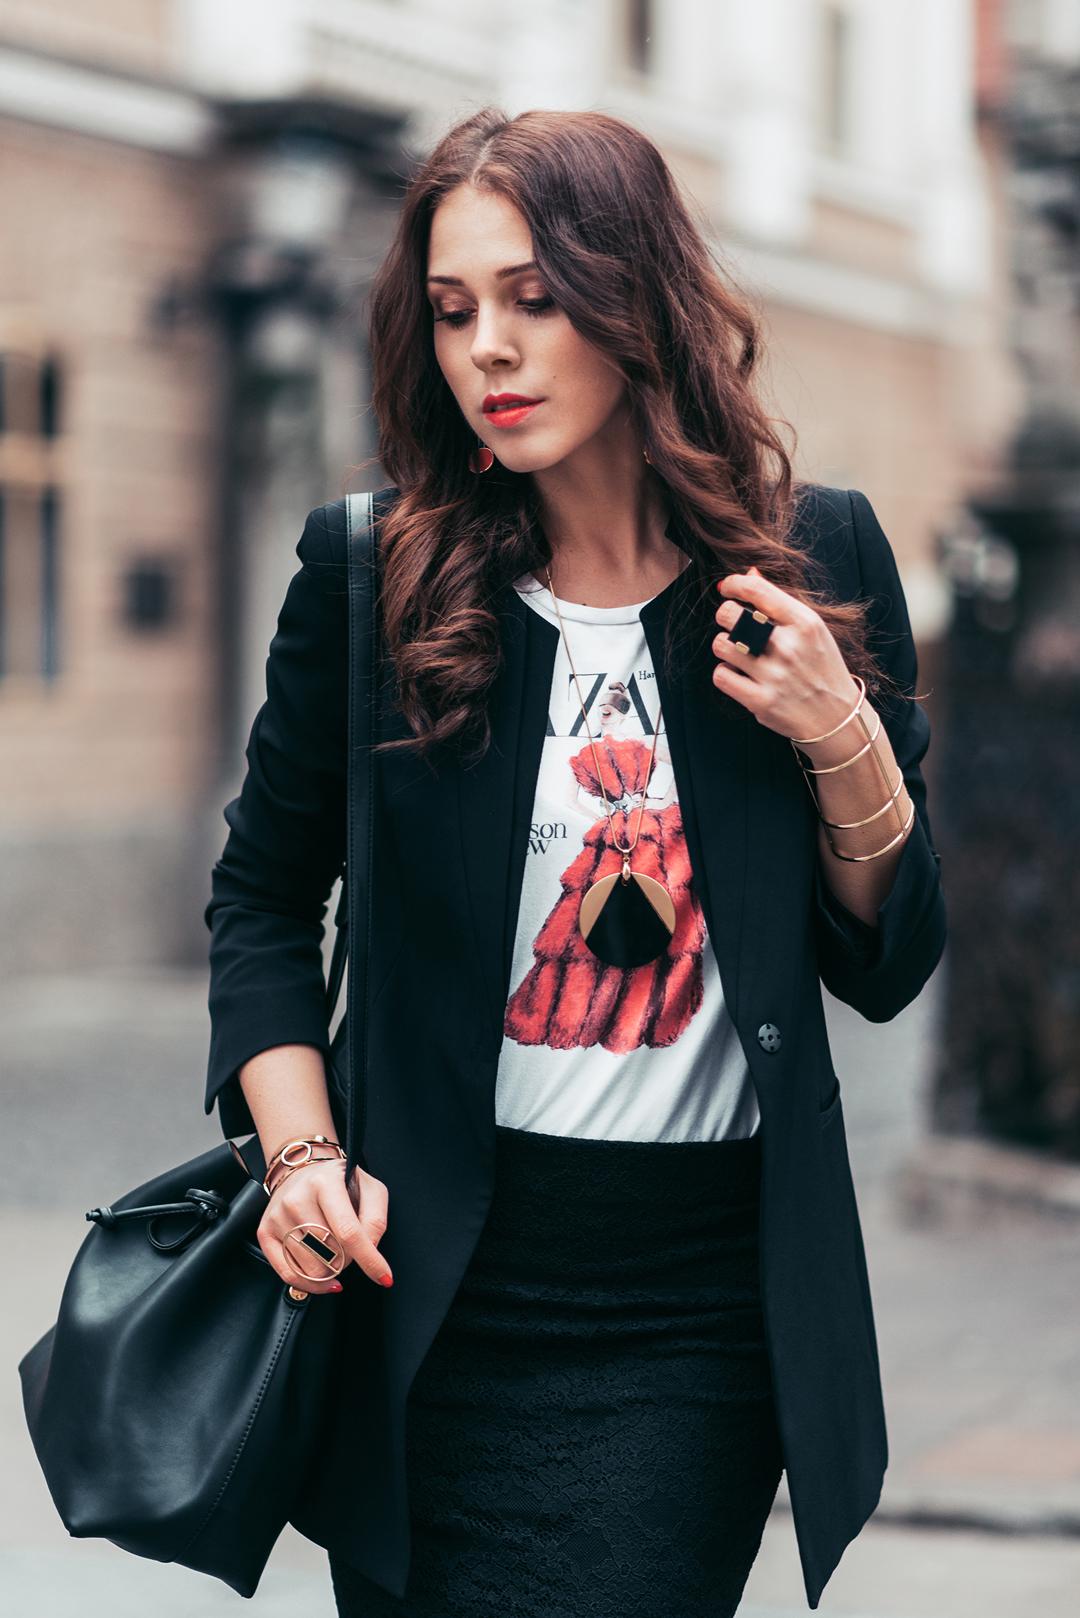 eva-ahacevcic_love-eva_ootd_six-accessories_zara-skirt_blazer_parfois-shoes_style_fashion-2